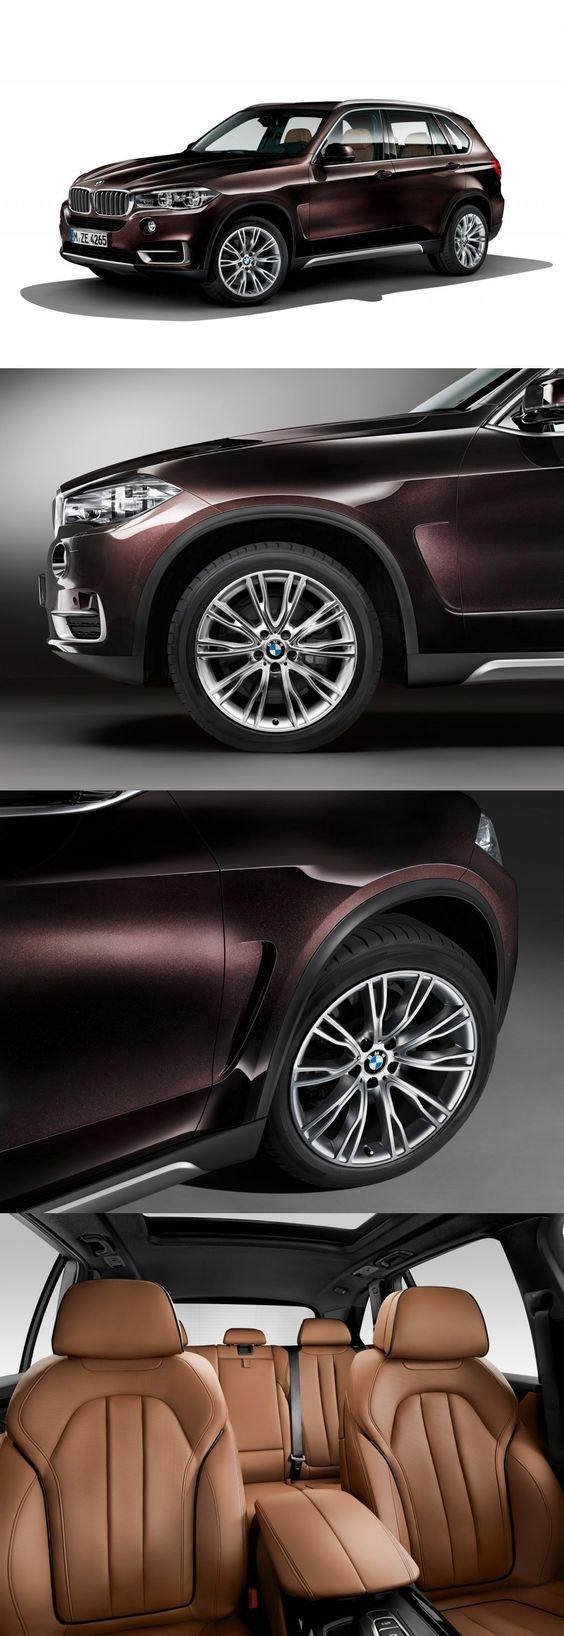 2014 BMW X5 enhanced by BMW Individual #bmw #mystyle #reneewalton